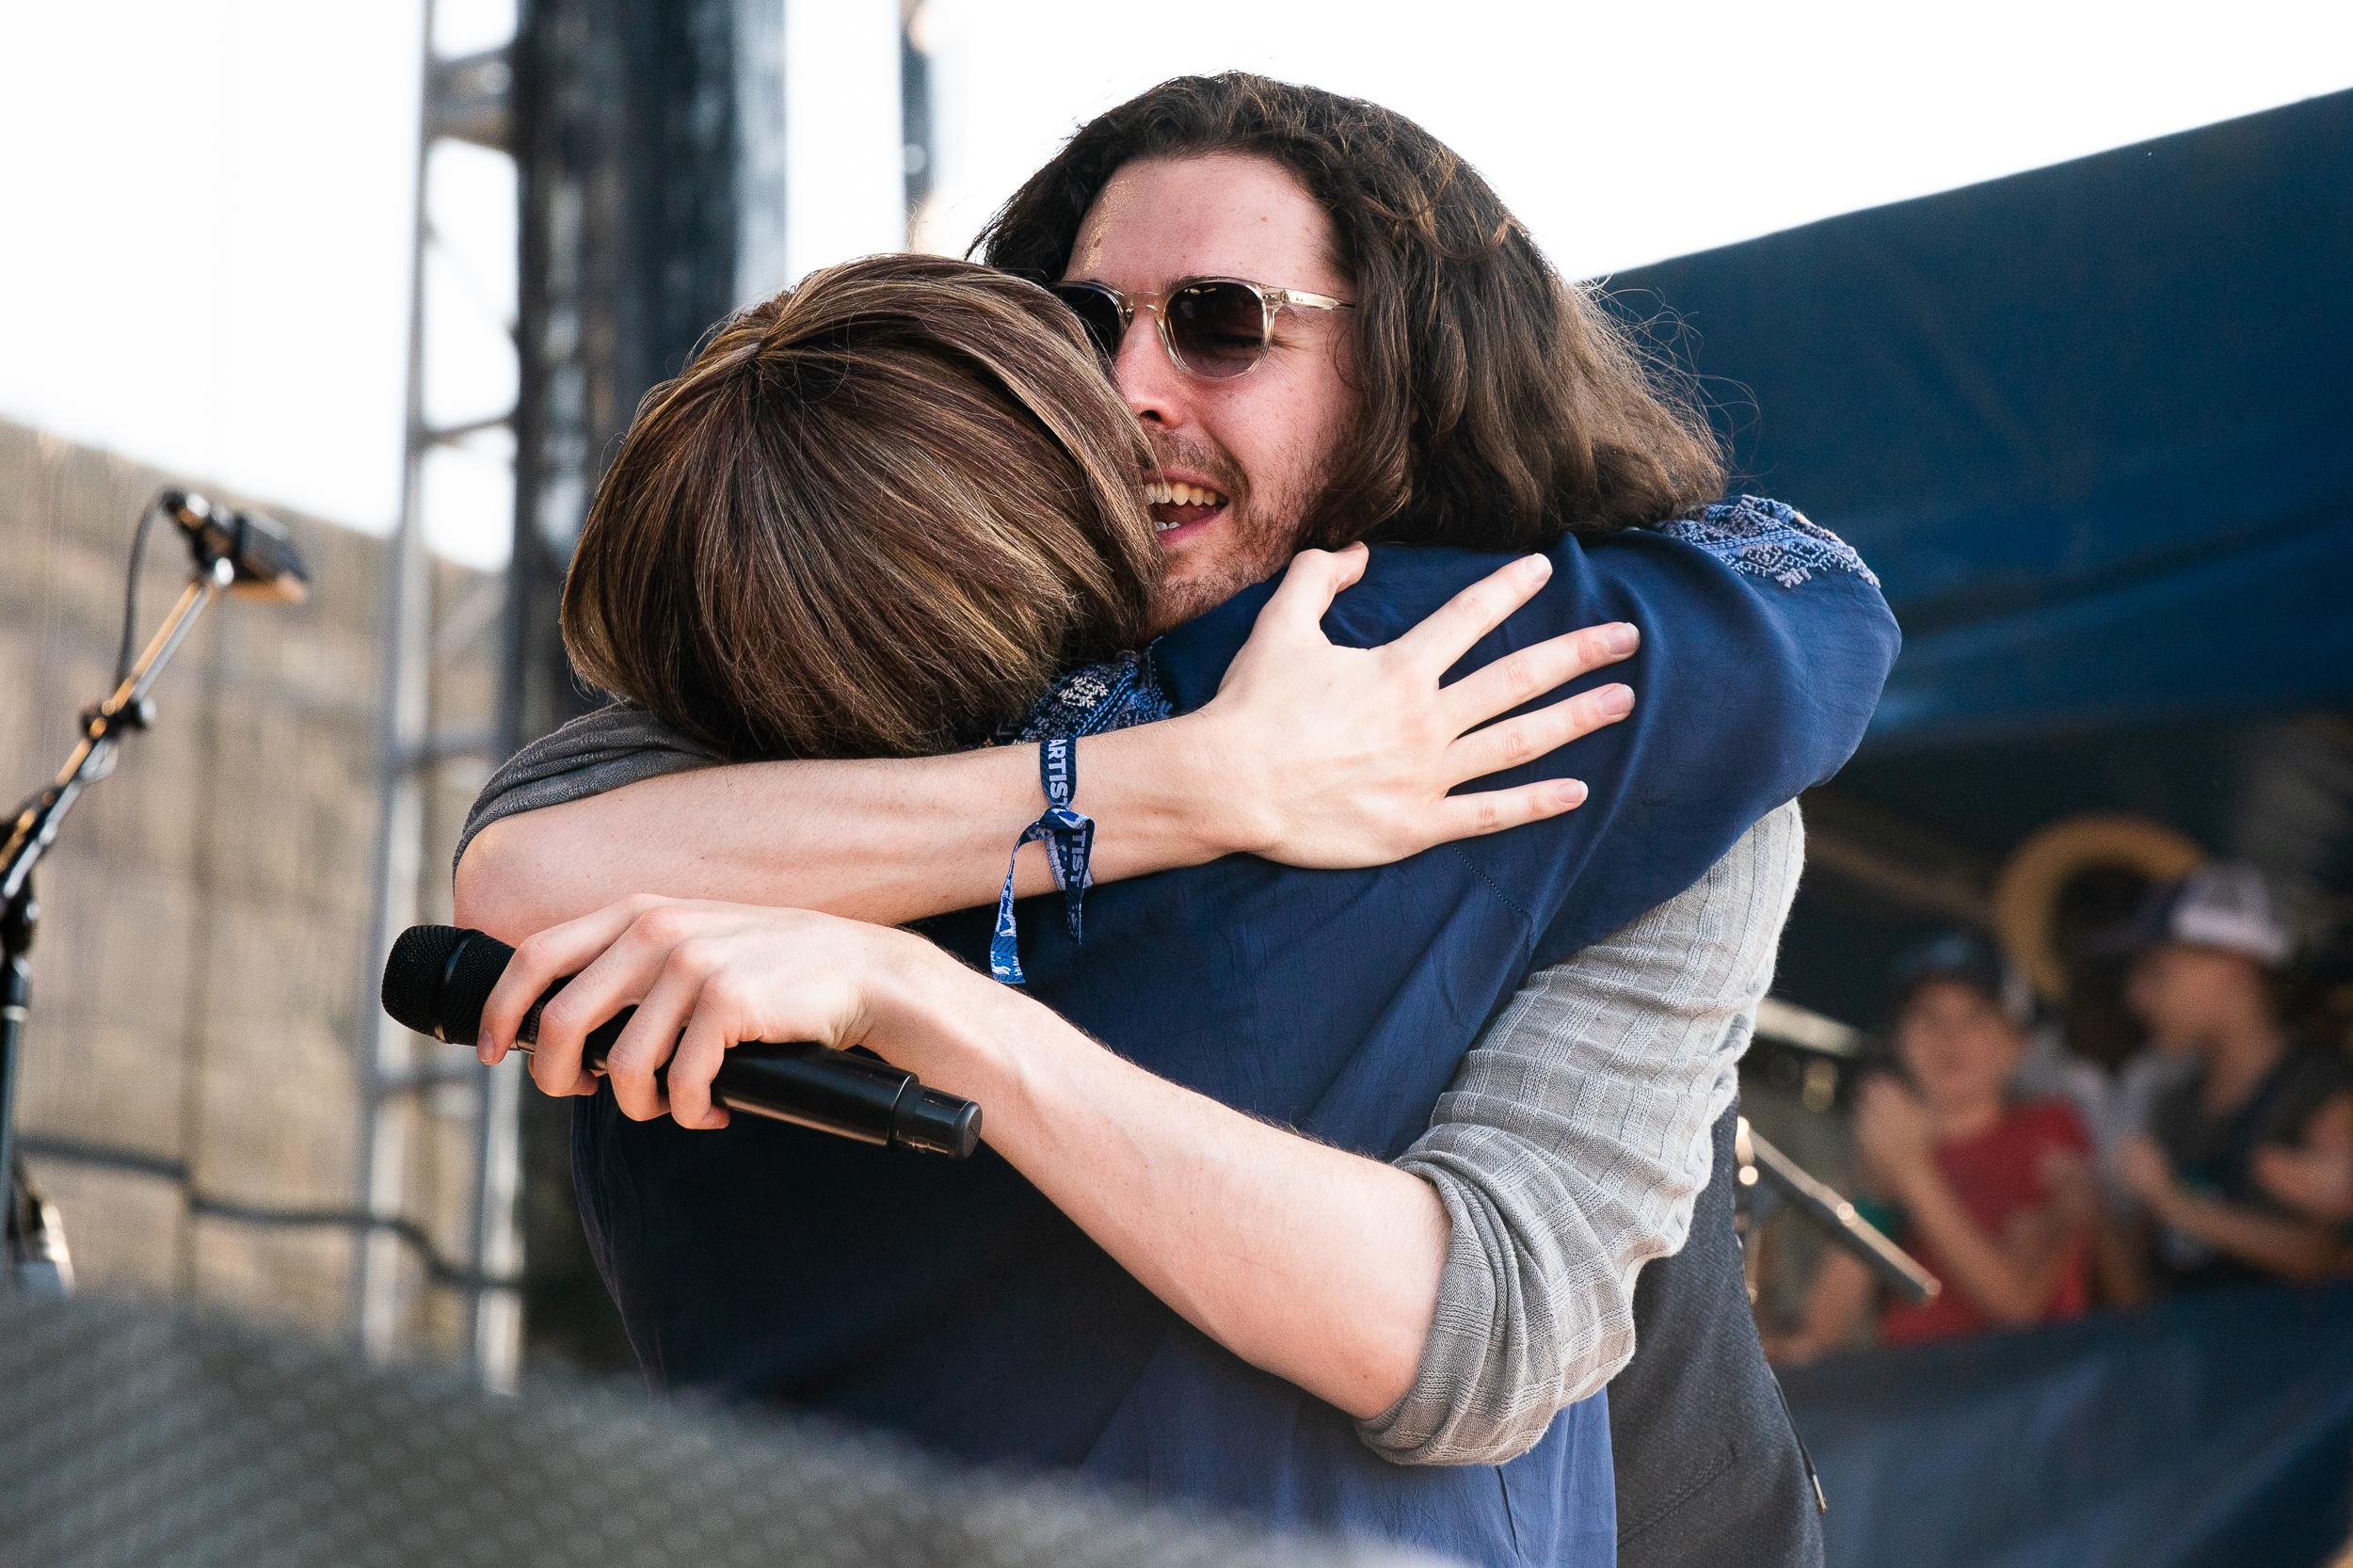 Mavis Staples and Hozier at Newport Folk Festival (Photo by Mauricio Castro)